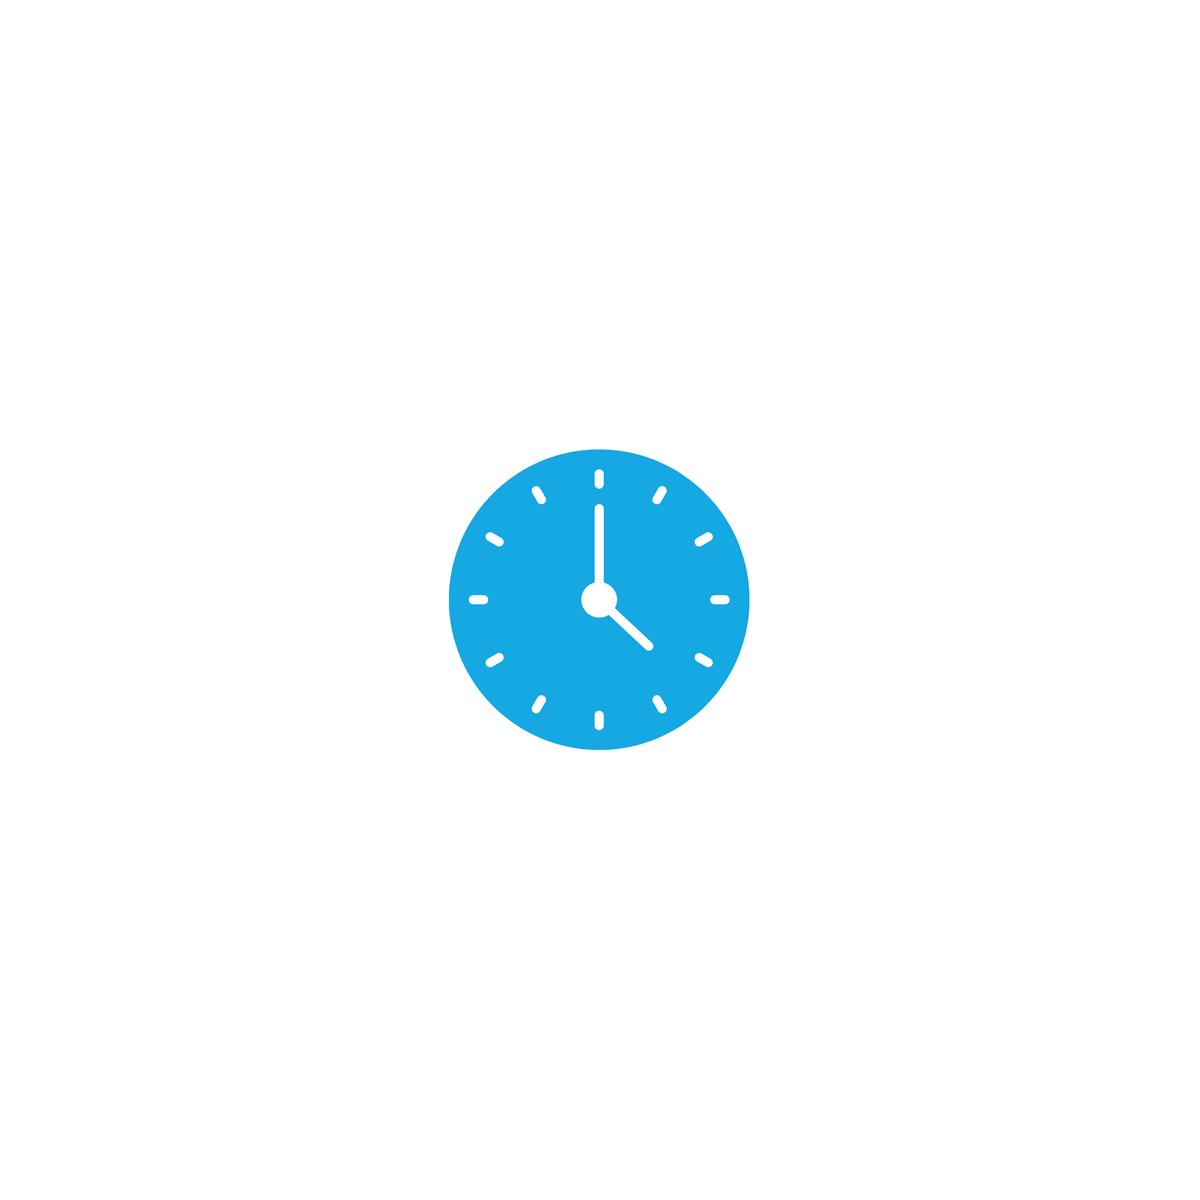 noun_clock_2499398 copy.jpg